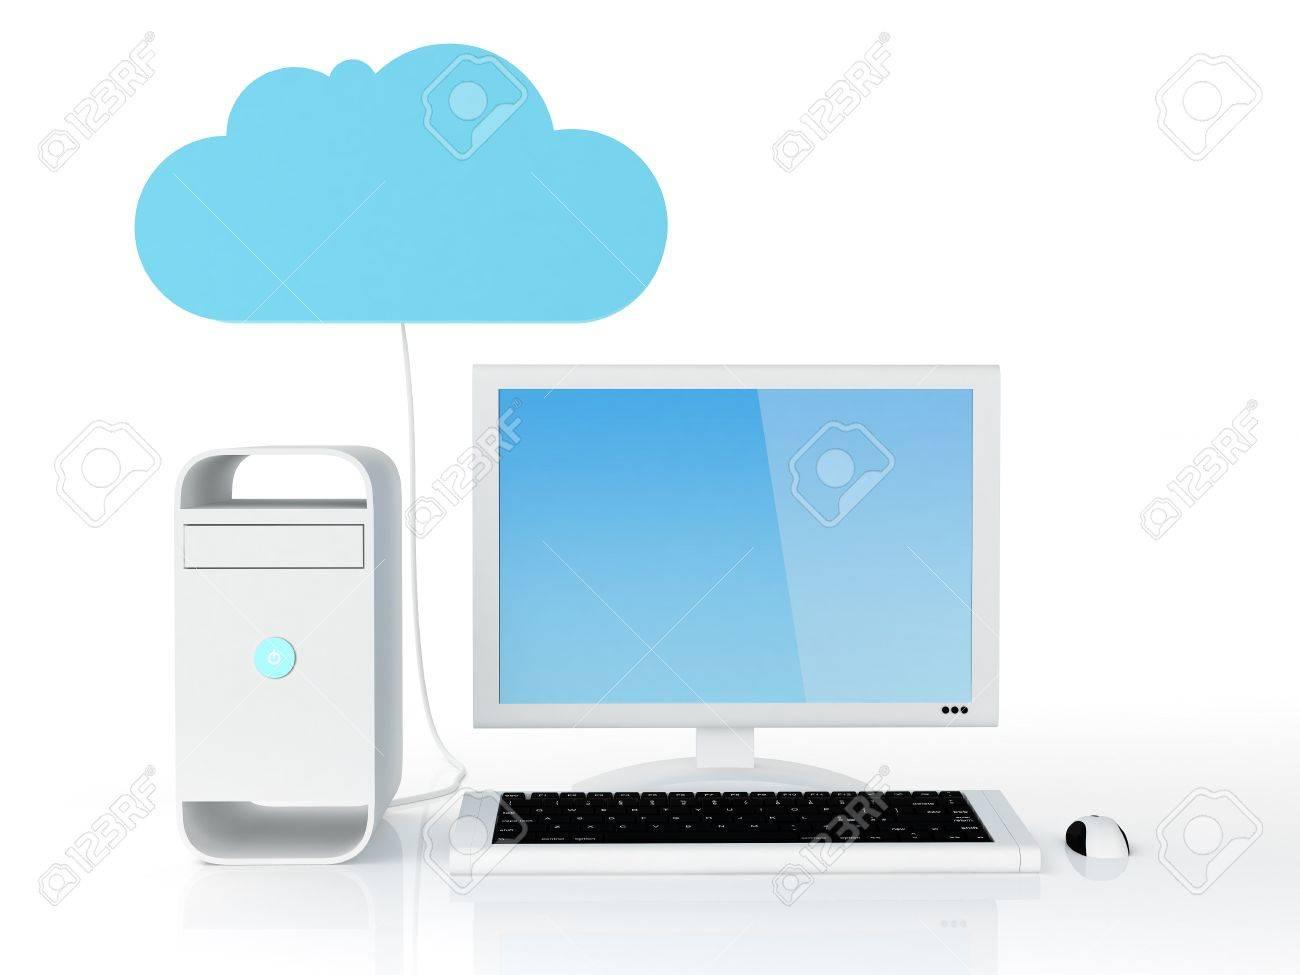 Swell Desktop Pc Connected To Cloud Servernote All Devices Design Interior Design Ideas Oteneahmetsinanyavuzinfo